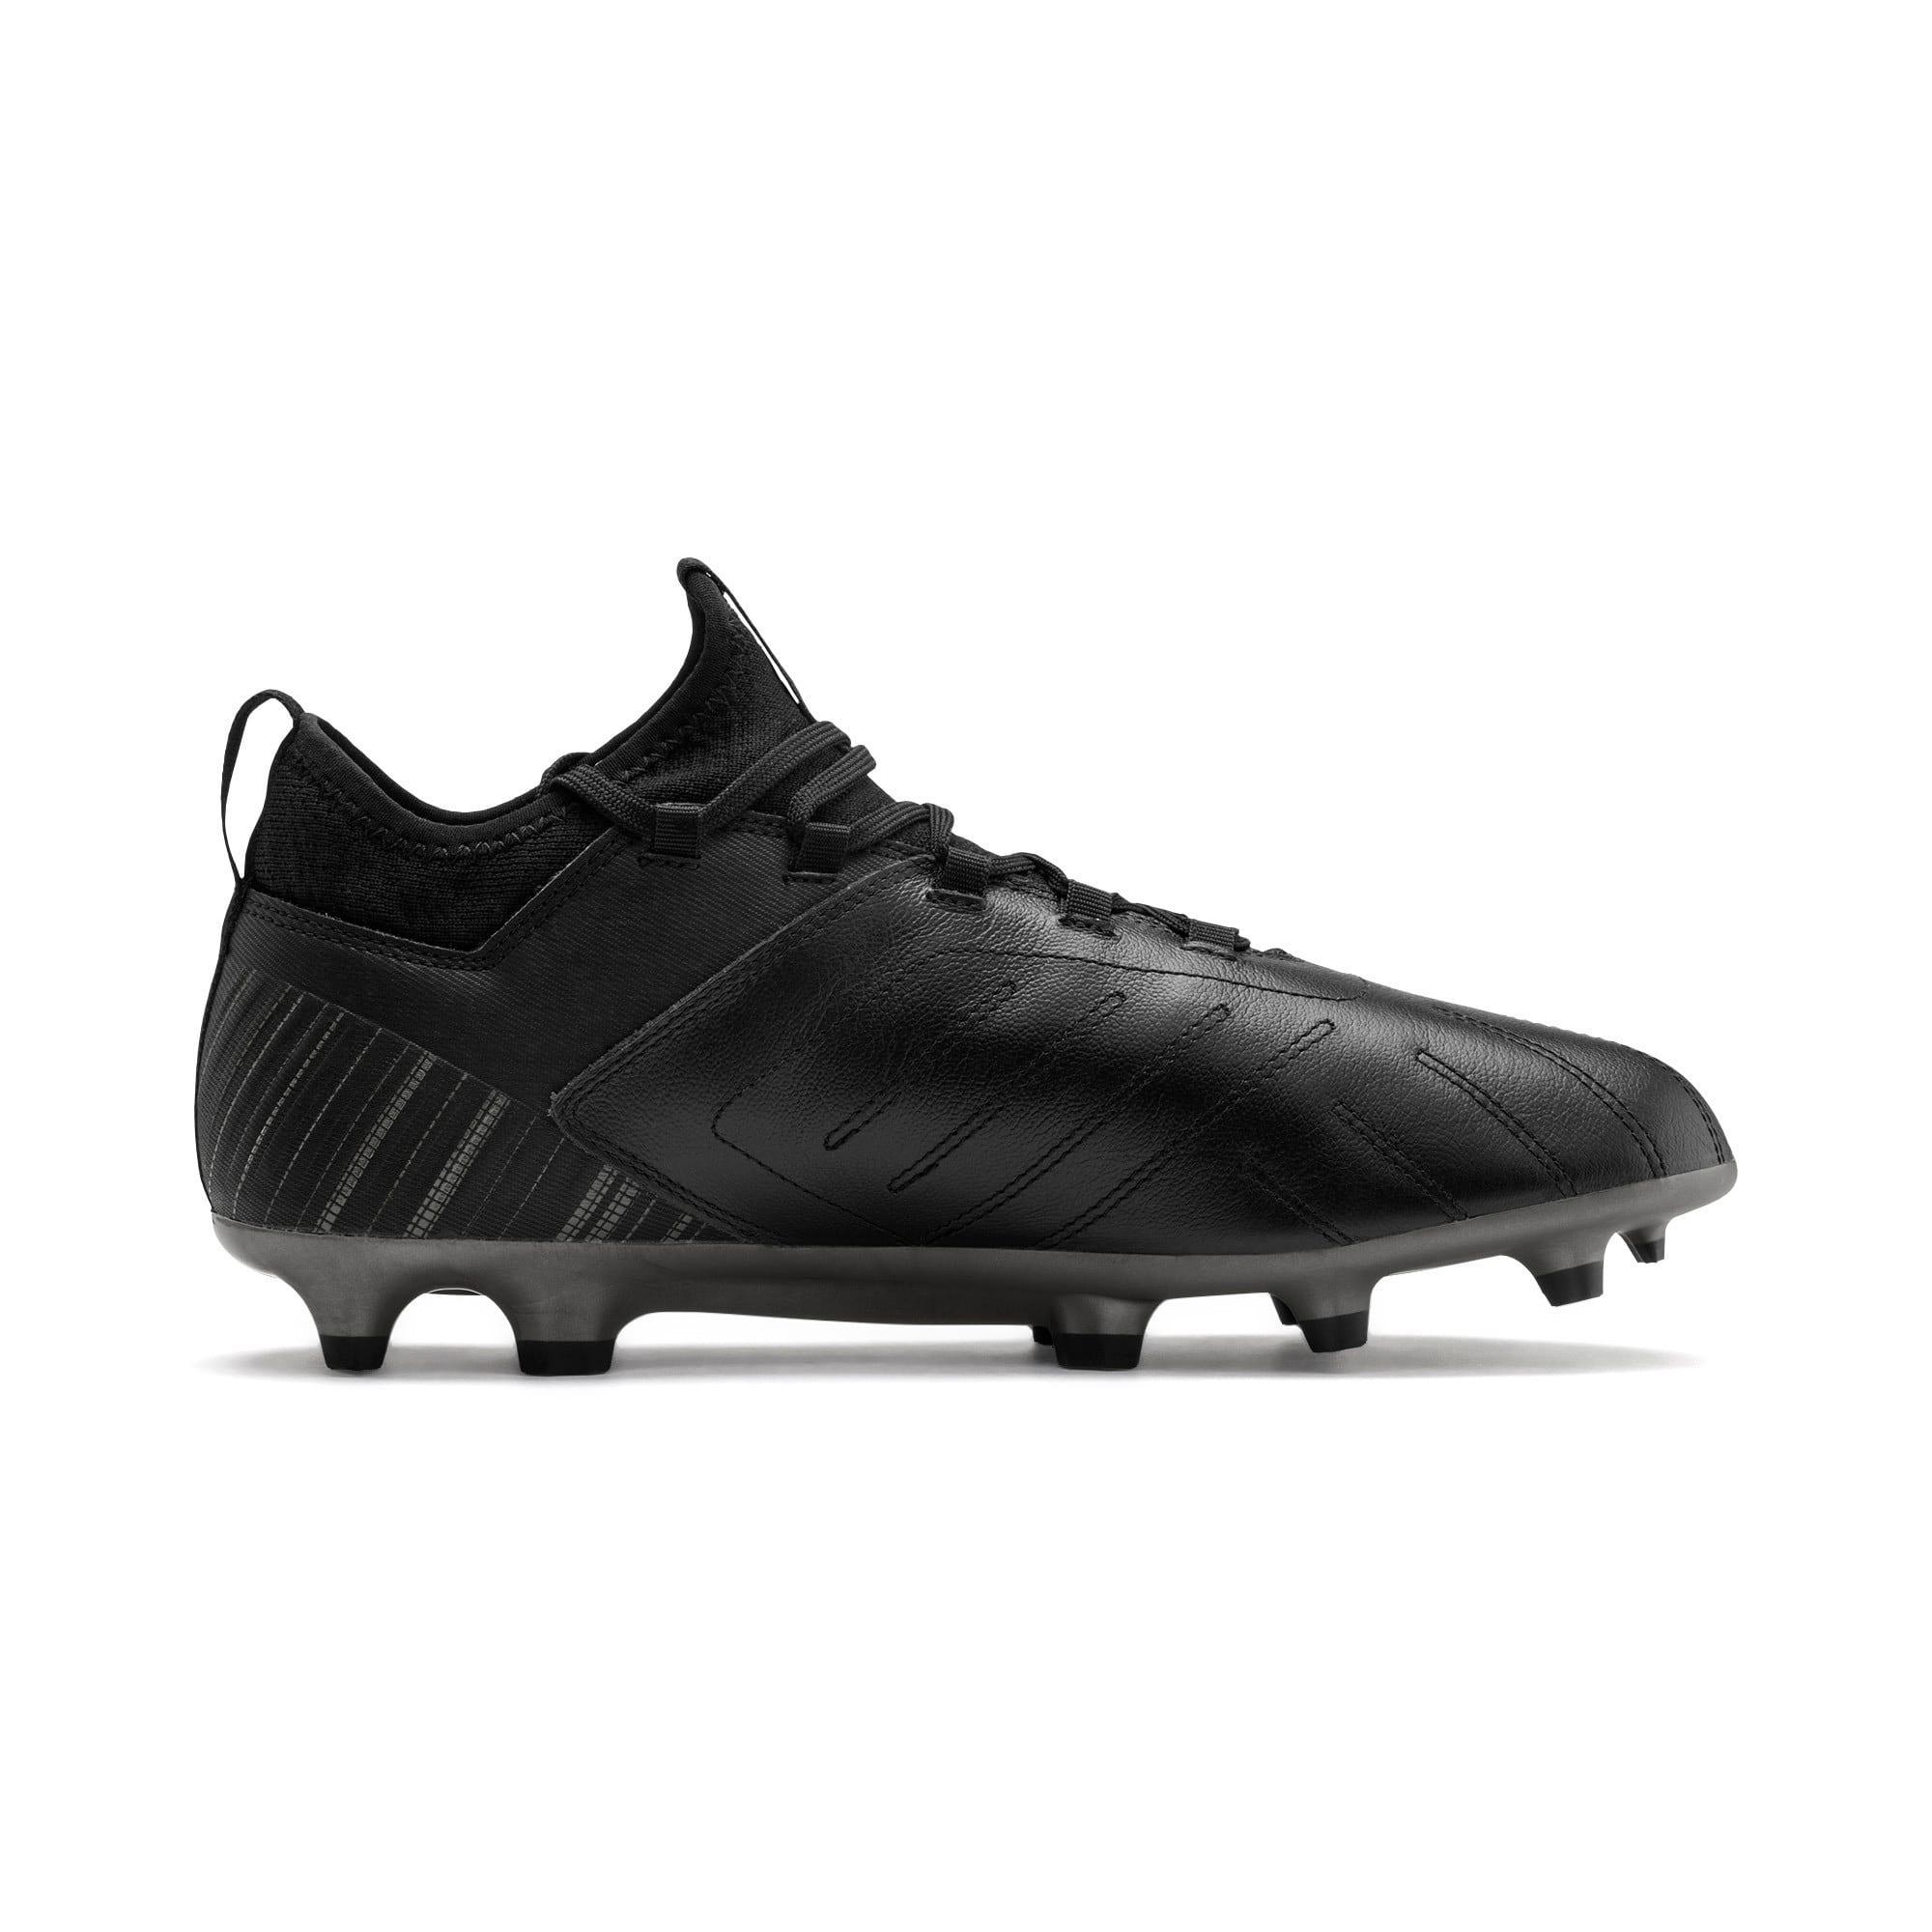 Thumbnail 6 of PUMA ONE 5.3 FG/AG Men's Soccer Cleats, Black-Black-Puma Aged Silver, medium